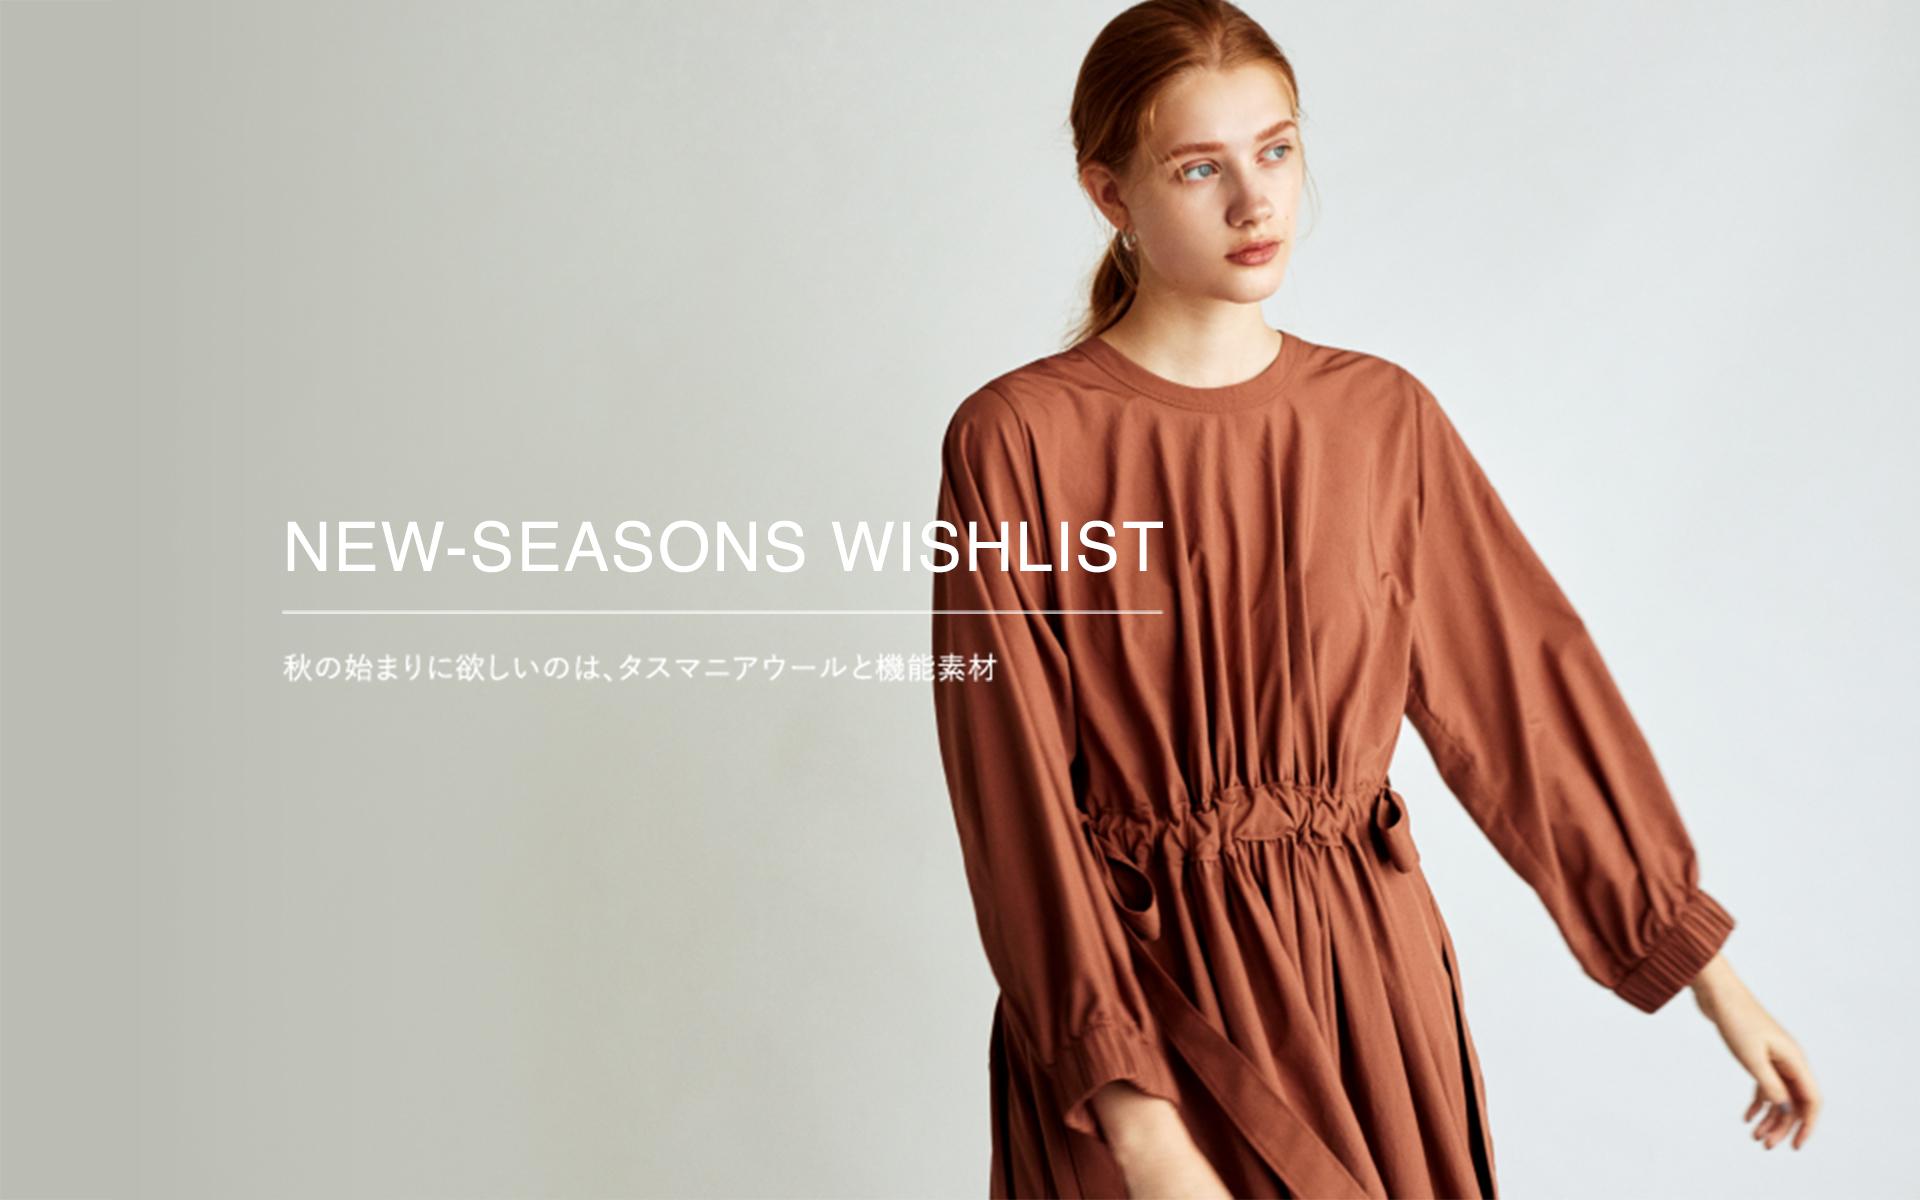 NEW-SEASONS WISHLIST 秋の始まりに欲しいのは、タスマニアウールと機能素材